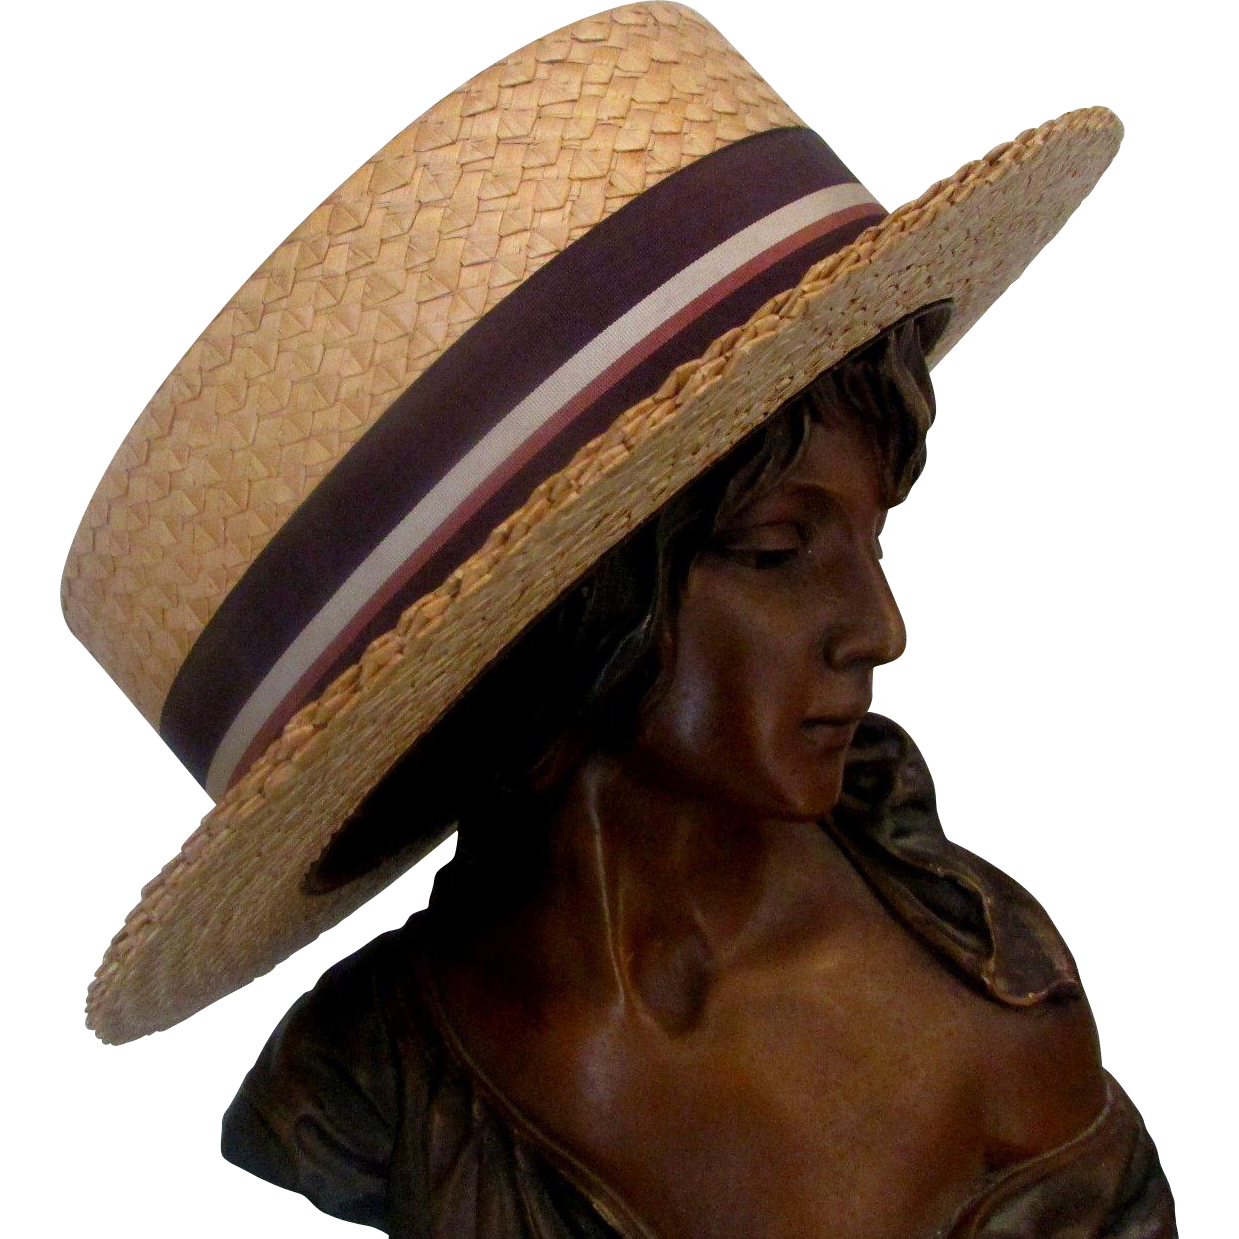 c01e0f1eb2a Vine Men S Straw Boater Hat Petersham Ribbon By Disney Hatter Co